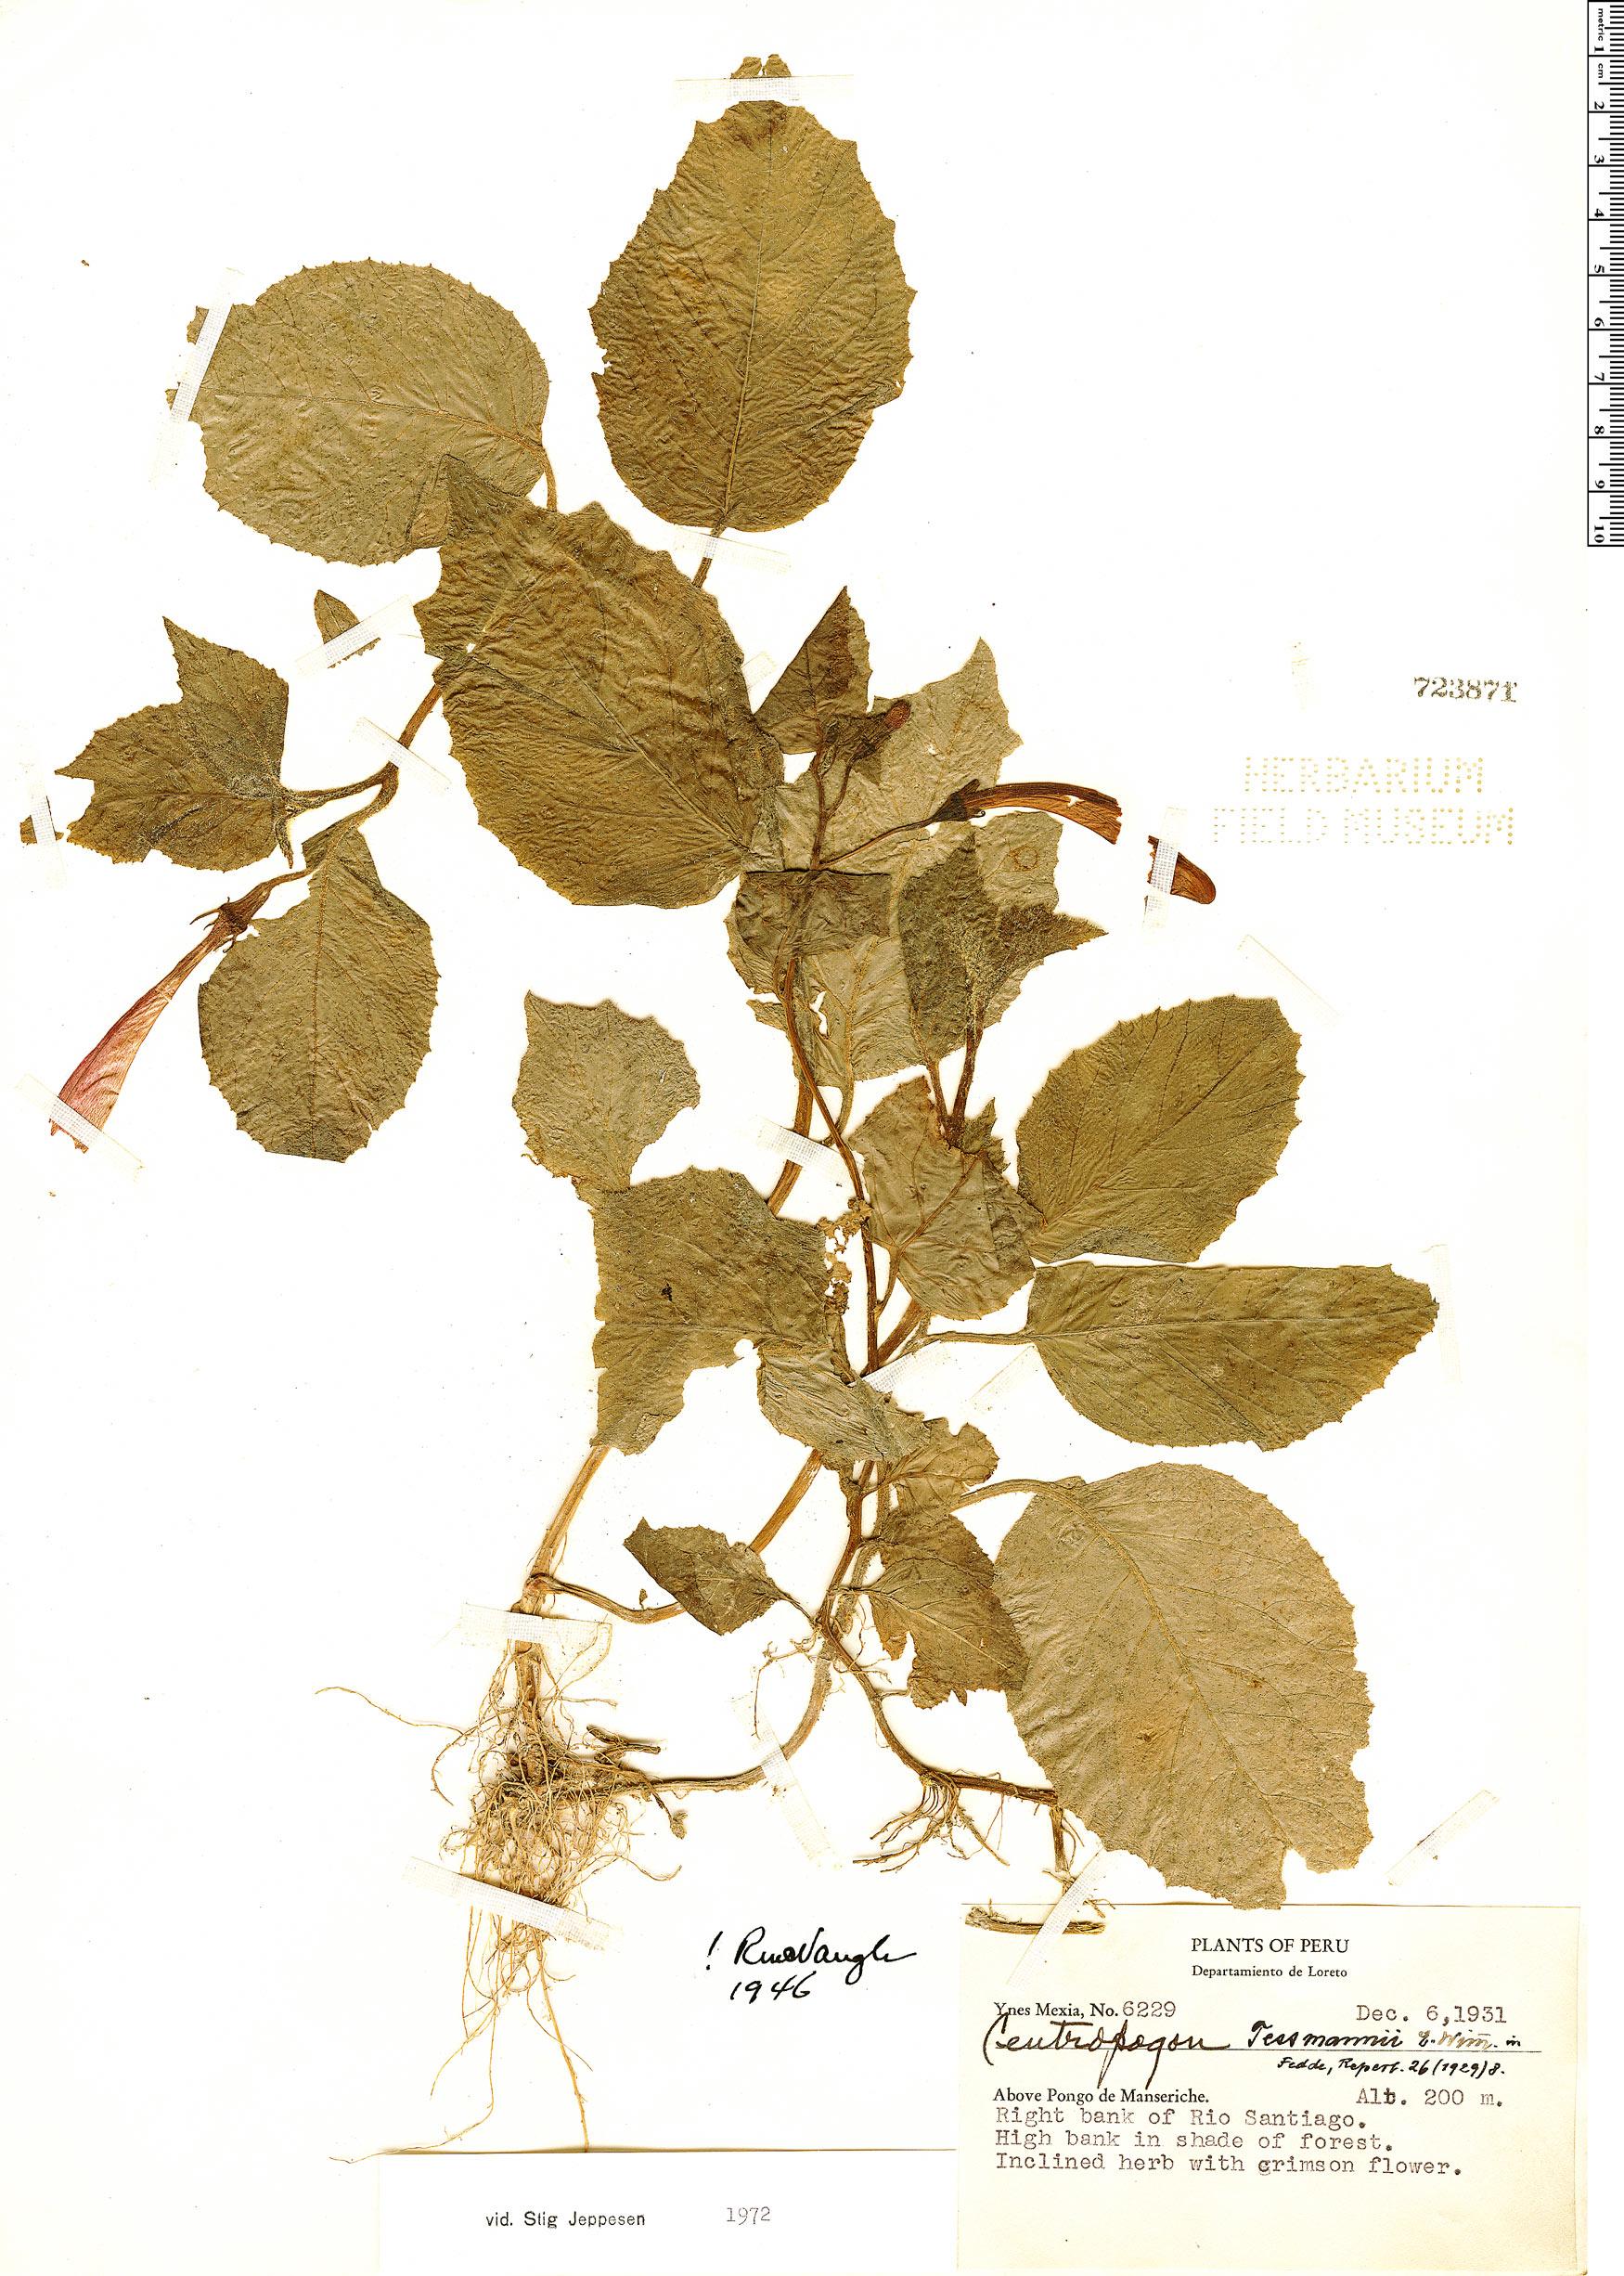 Specimen: Centropogon tessmannii